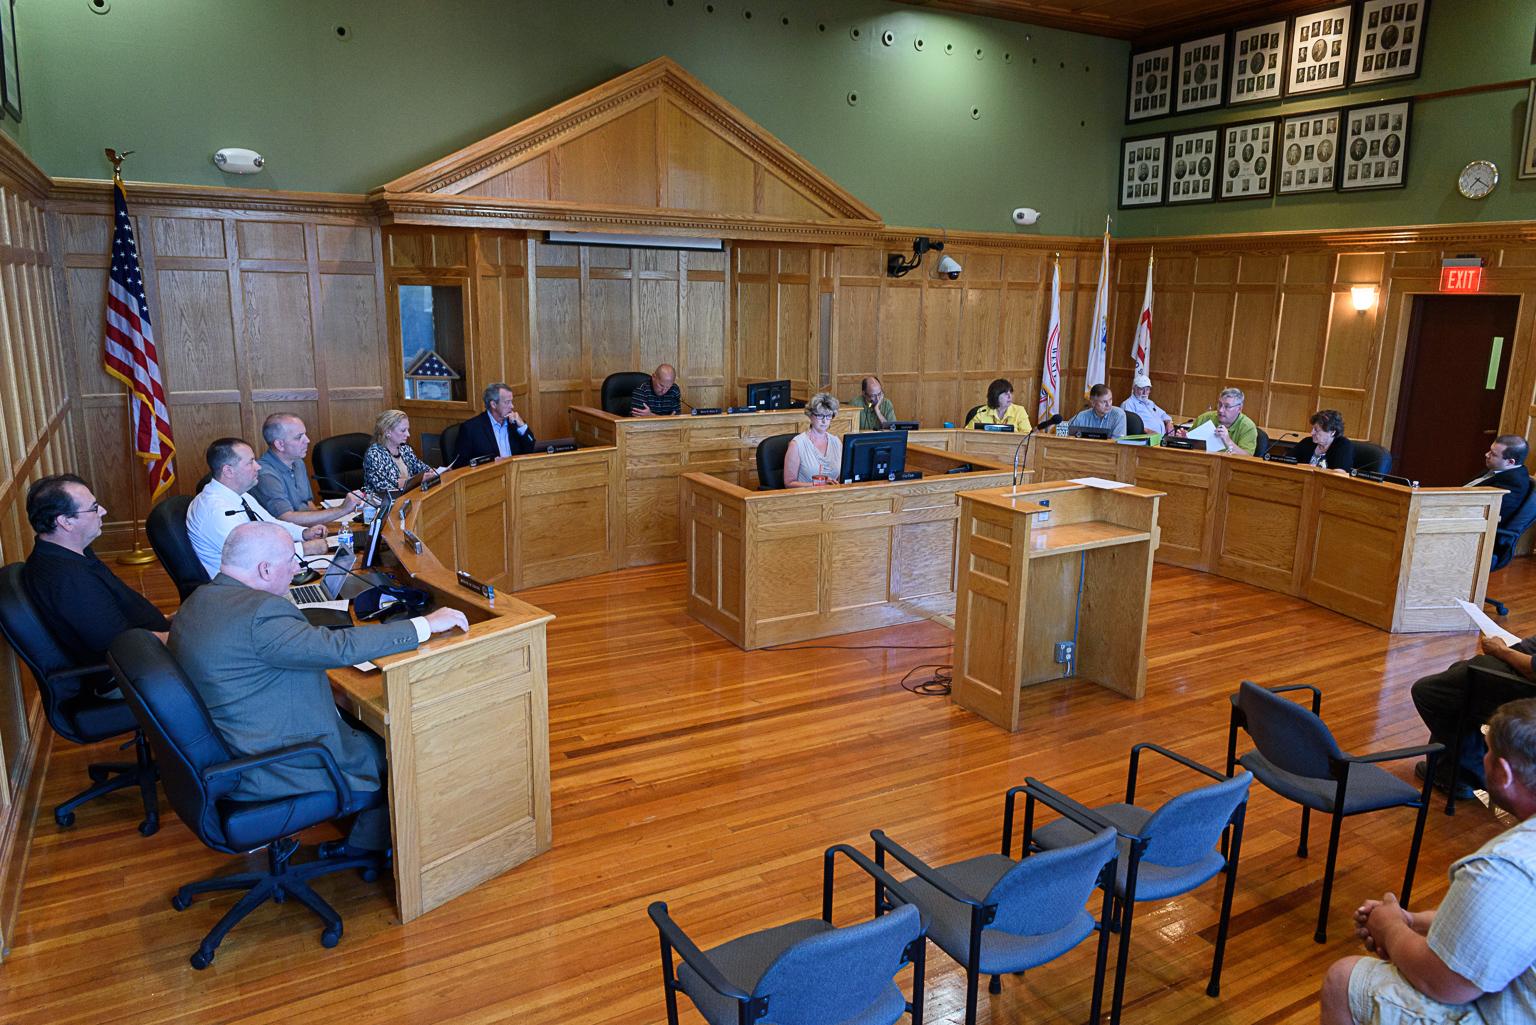 Taxes on agenda for City Council Thursday